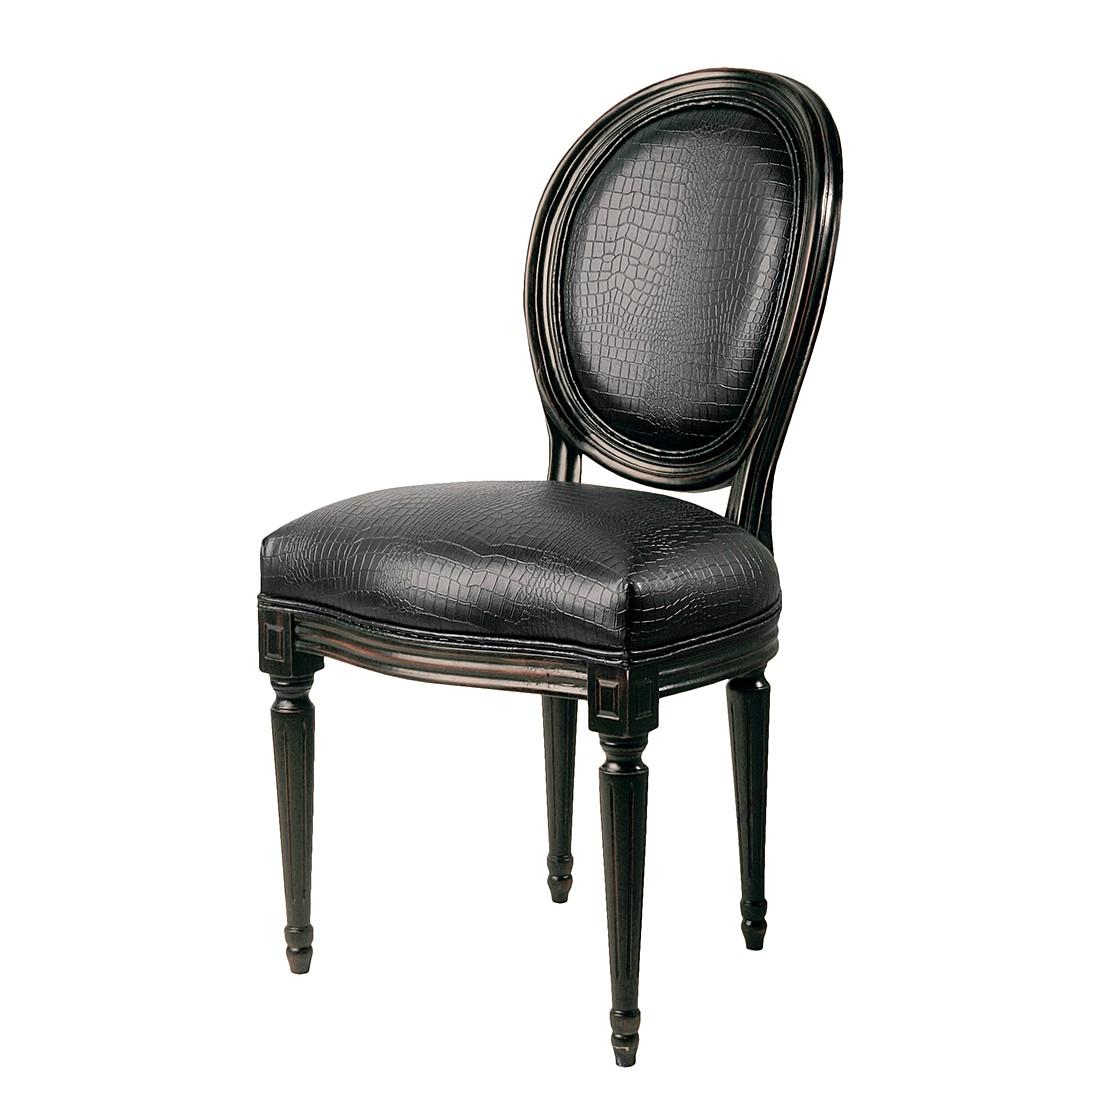 Gestoffeerde stoelen Metropolis Louis (2-delige set) - massief kampferhout/bruin kunstleer, Kare Design